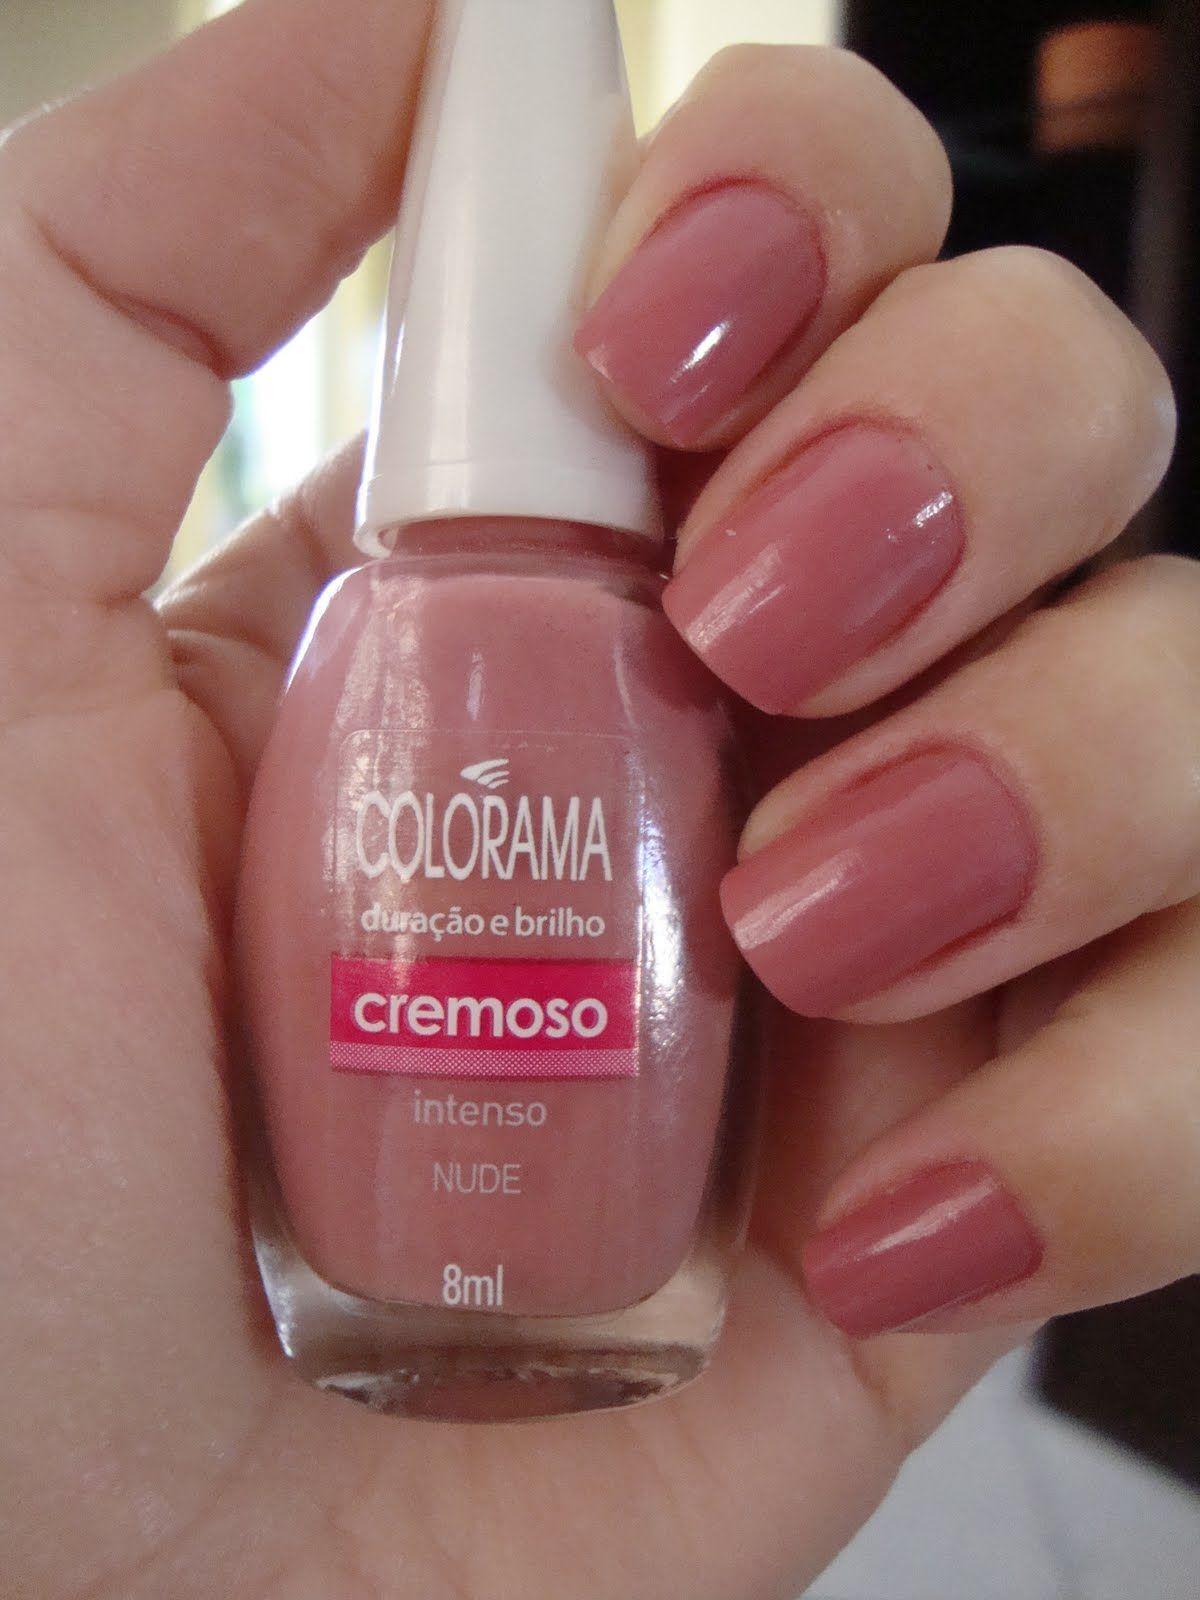 esmalte nude colorama - Pesquisa Google | Nails Nails Nails ...